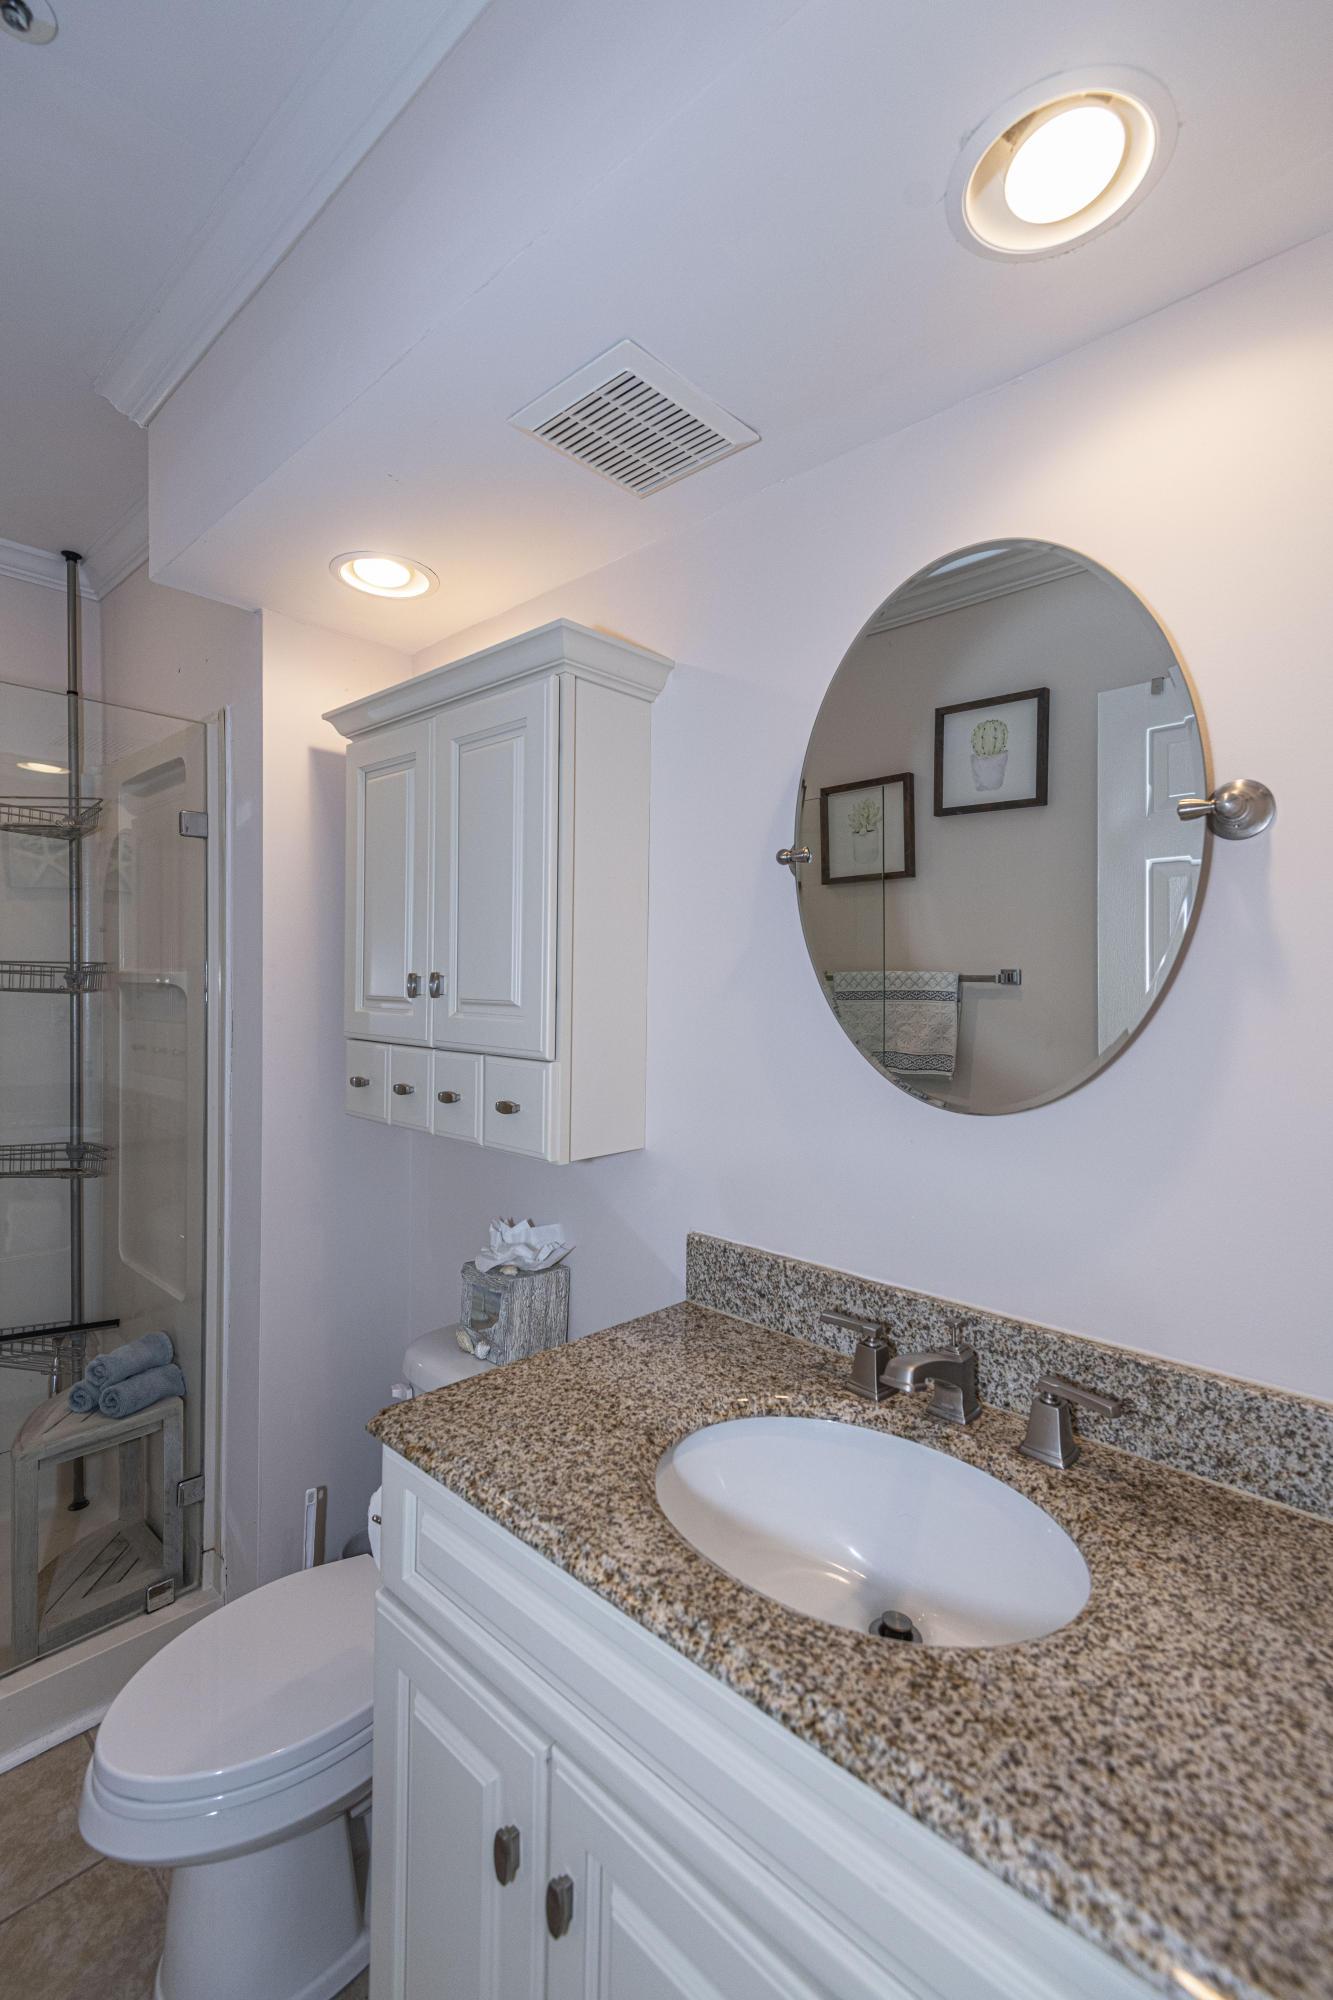 Marshview Villas Homes For Sale - 165 Mariners Cay, Folly Beach, SC - 35